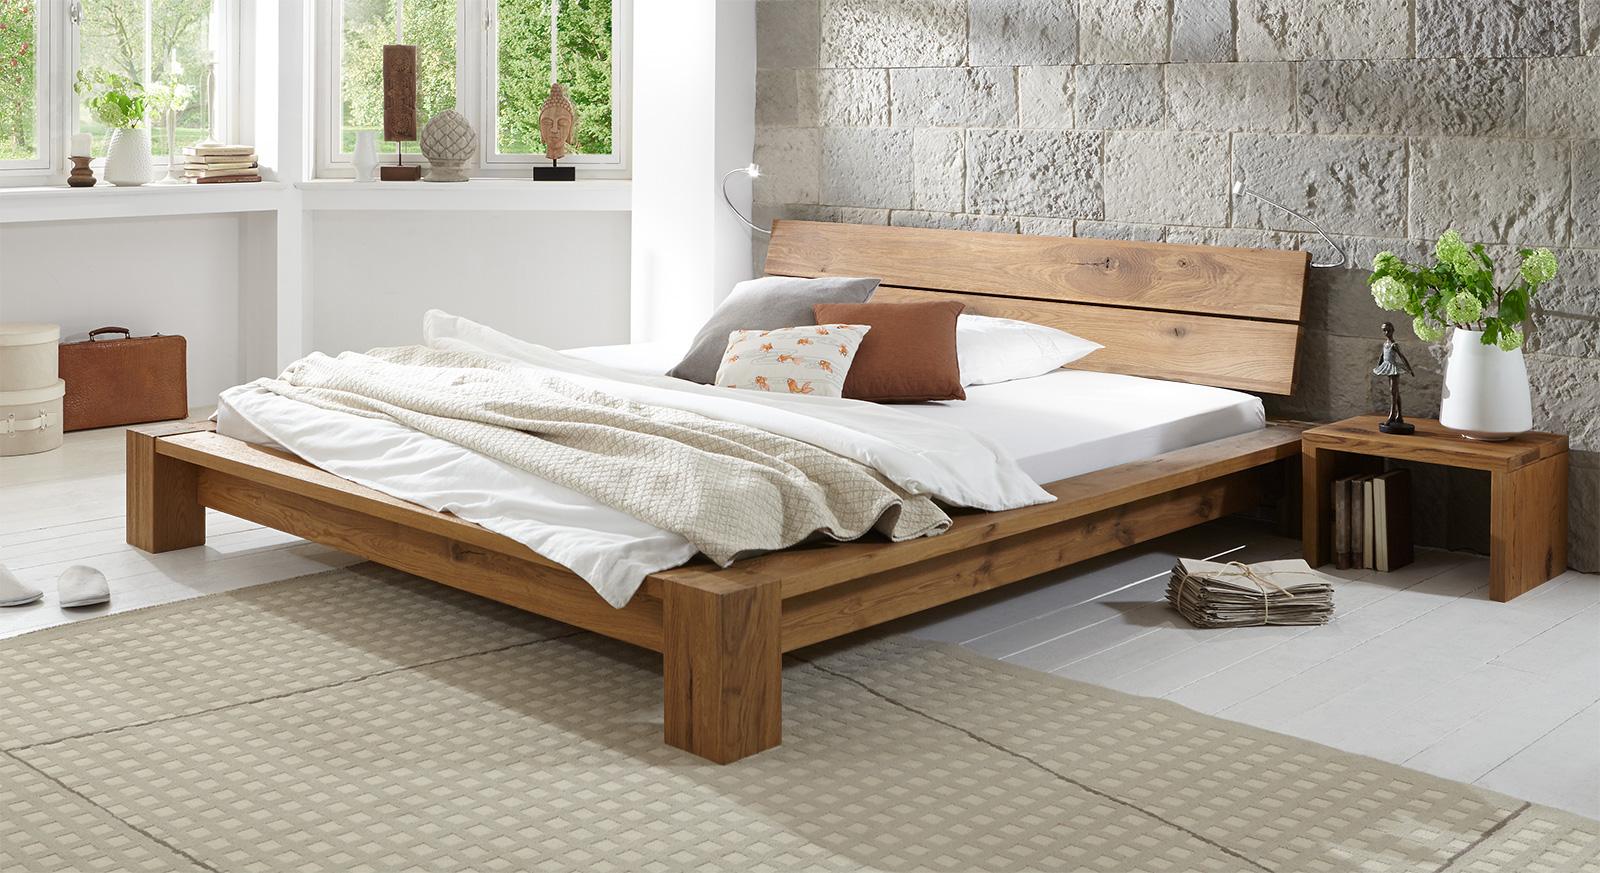 massivholzbett in komforth he aus ge lter wildeiche navia. Black Bedroom Furniture Sets. Home Design Ideas